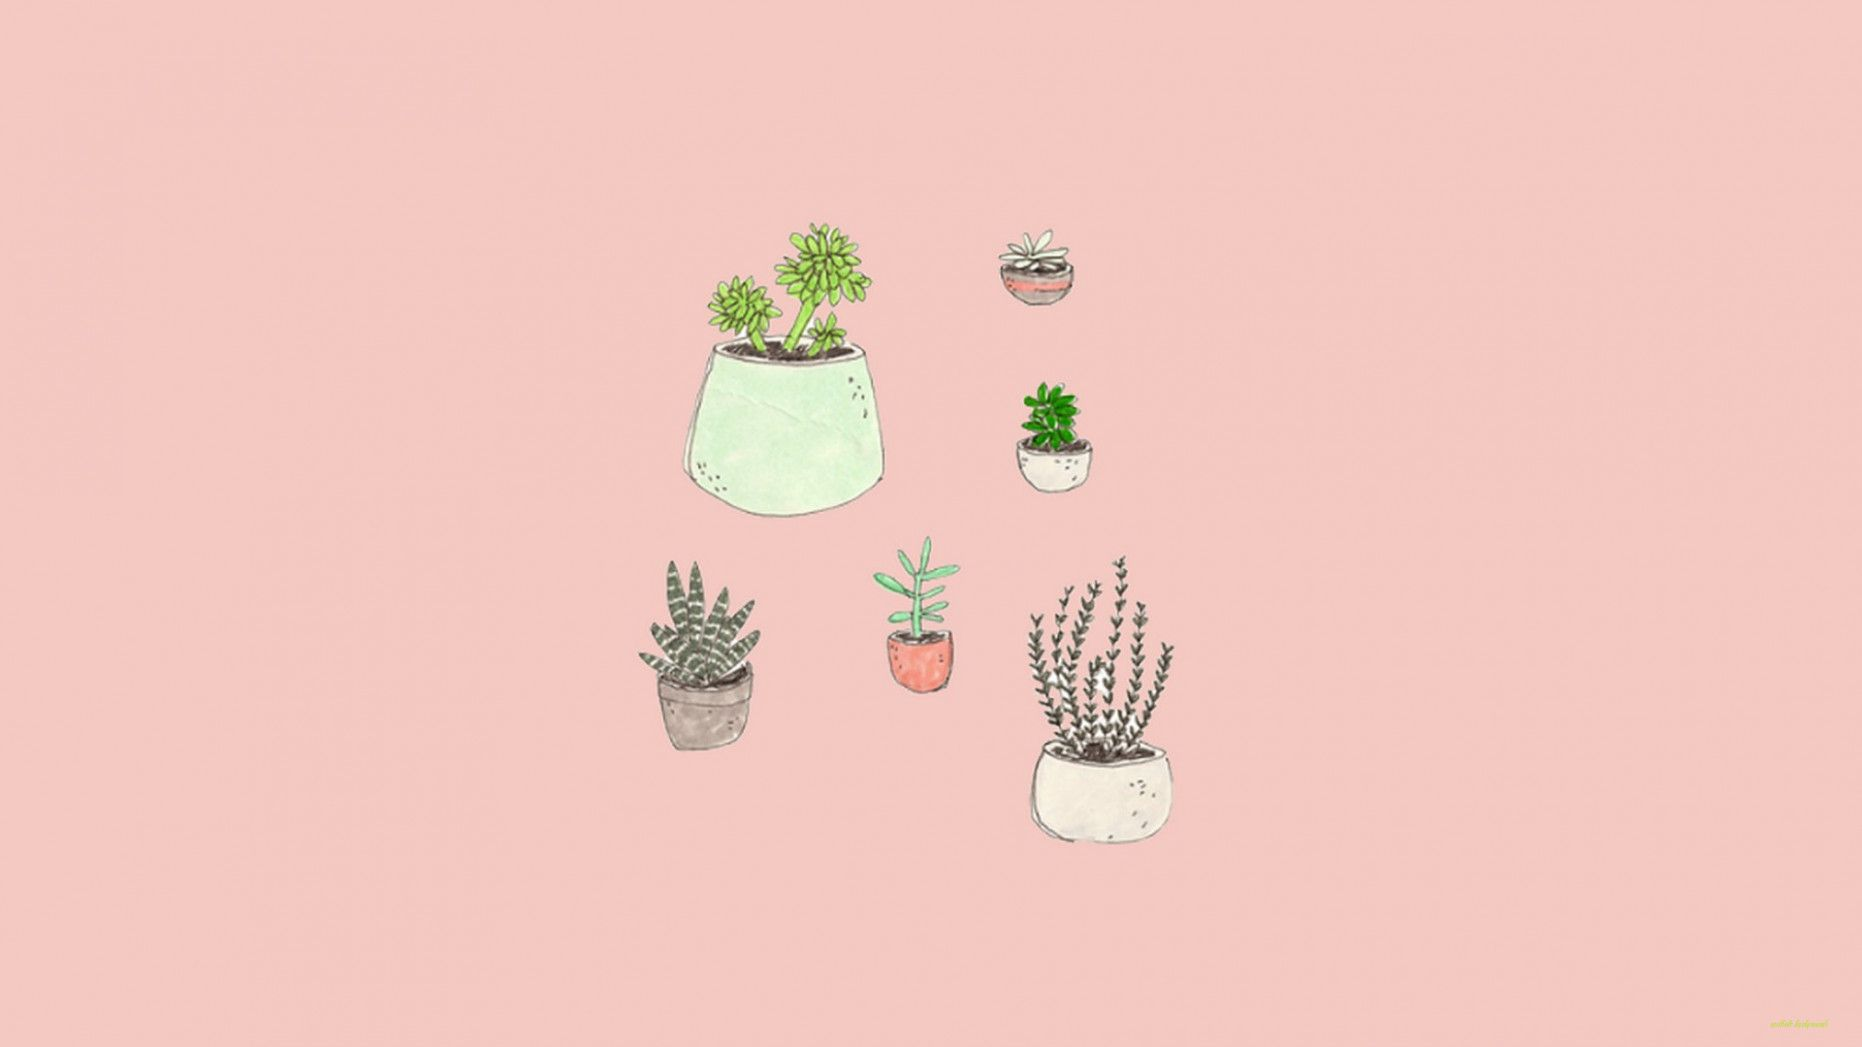 Cute Mac Wallpapers Tumblr